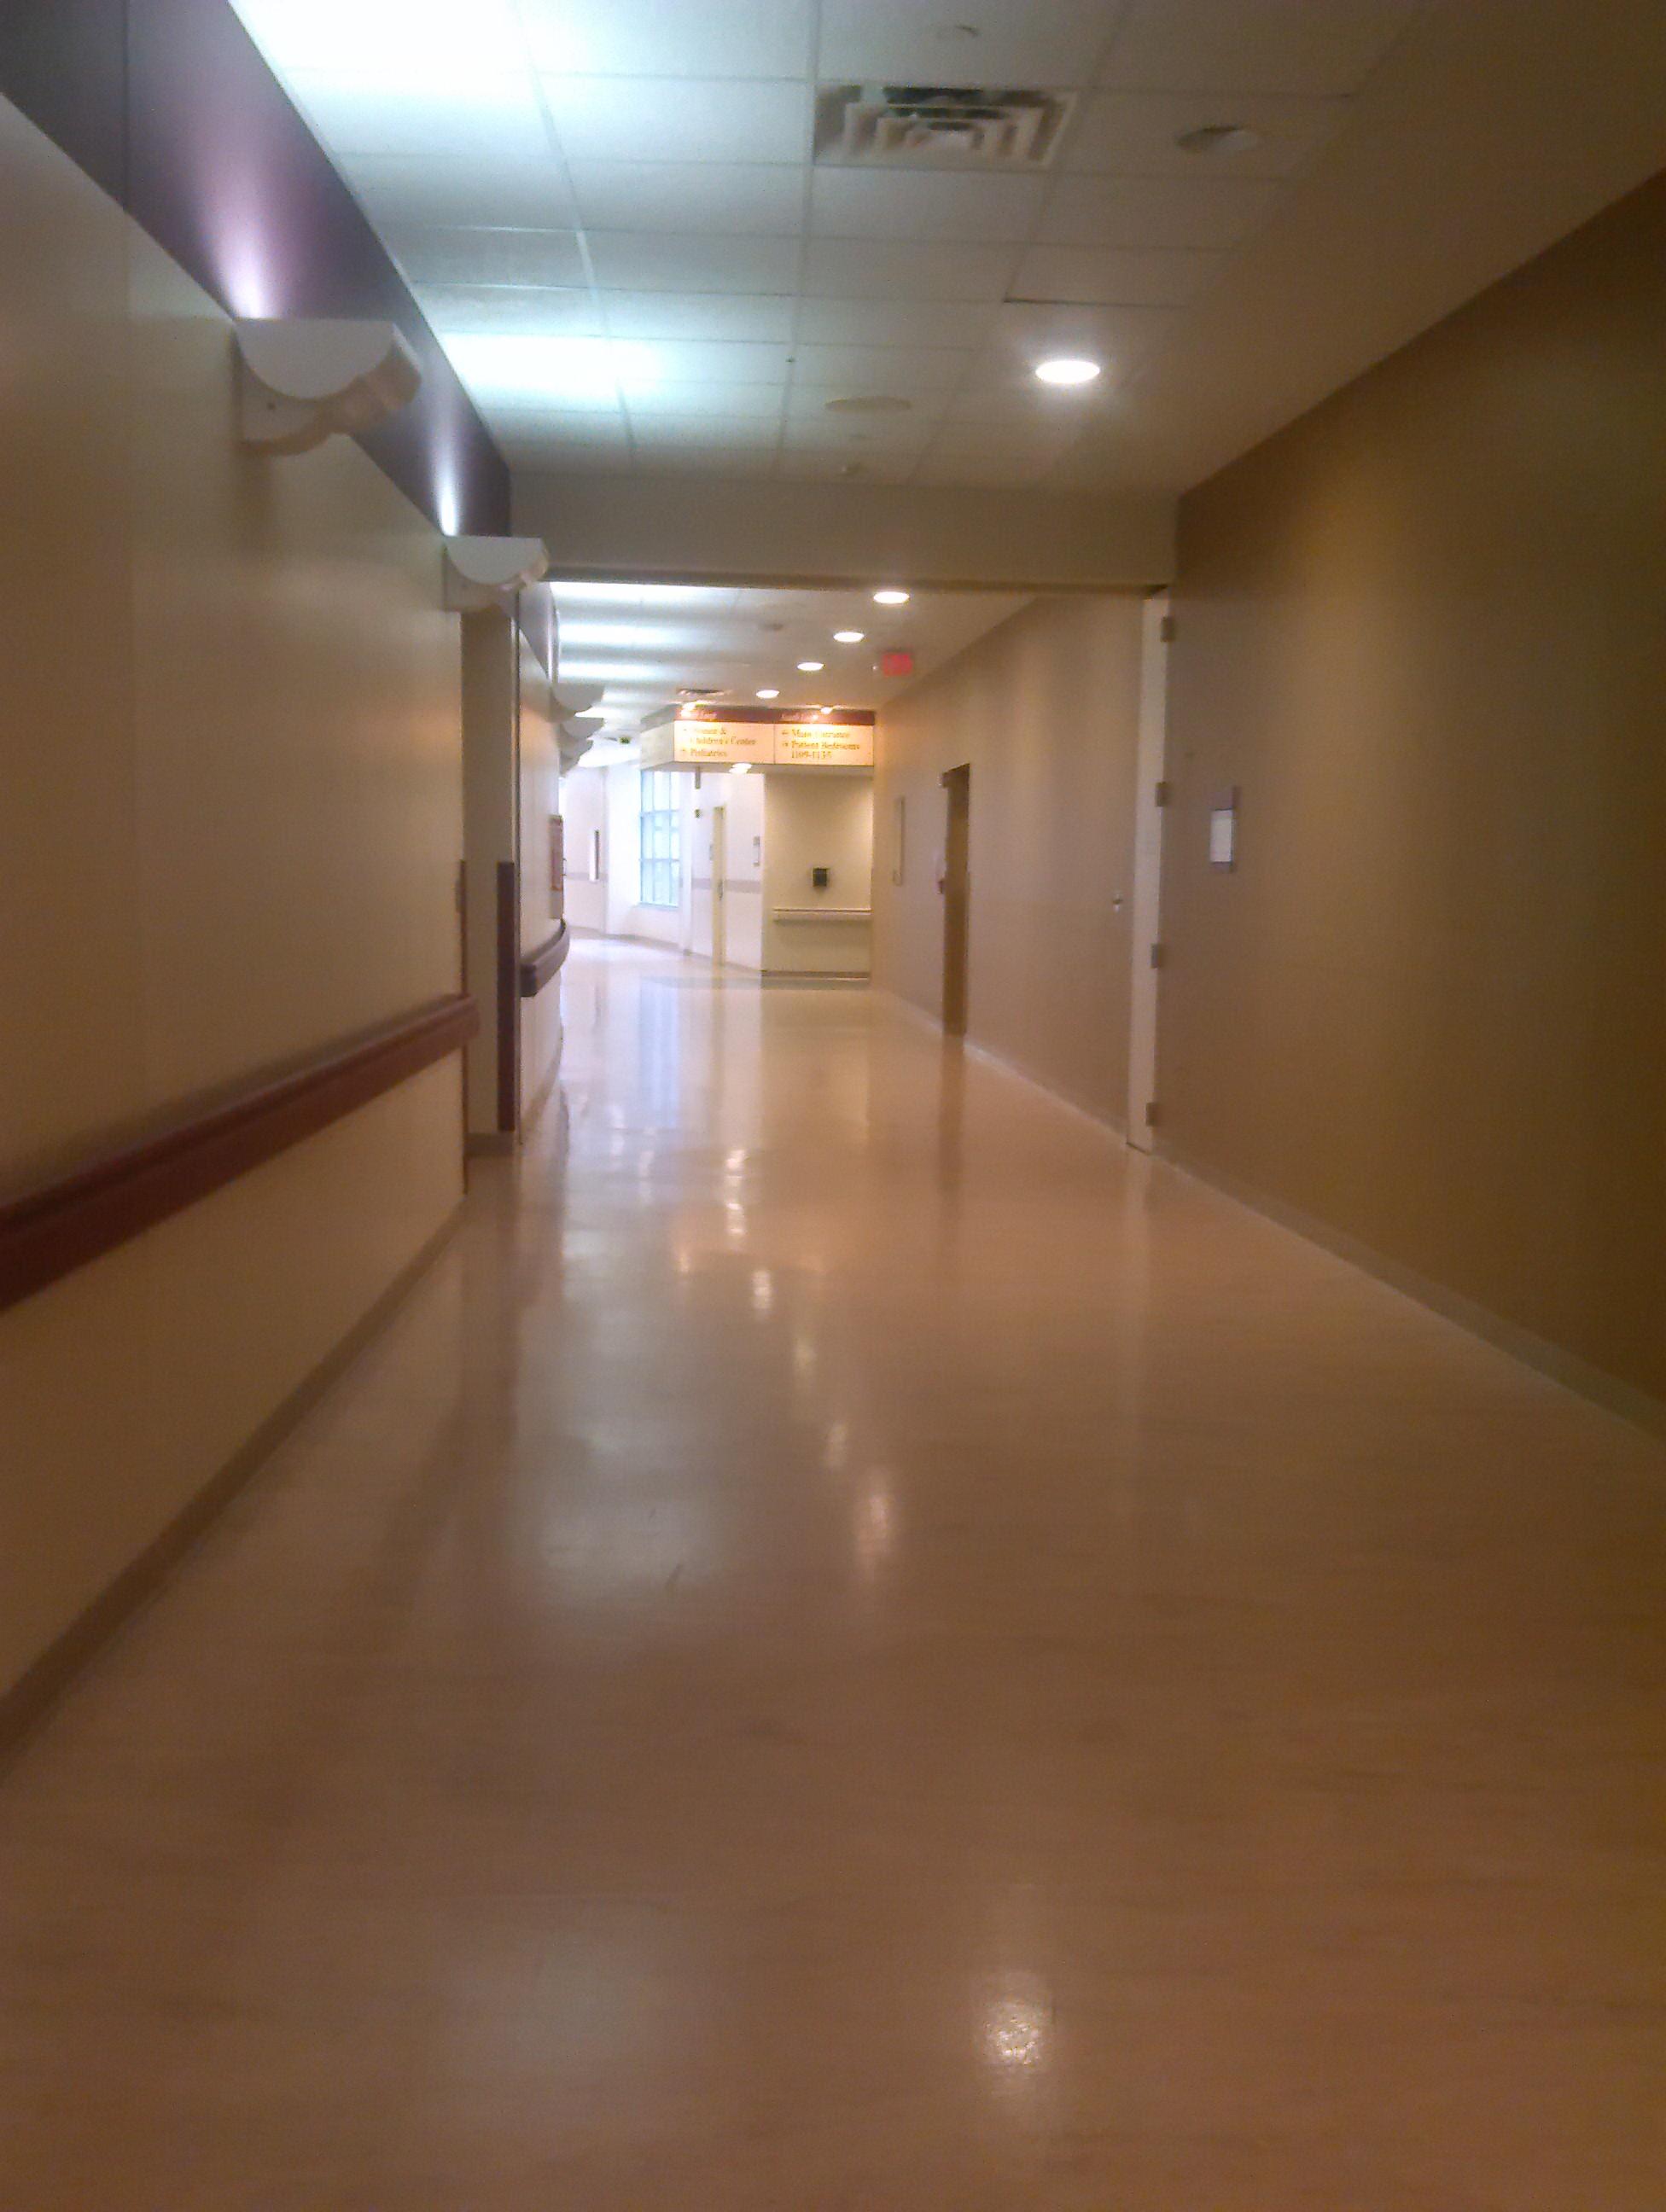 Long Creepy Hallway Genesys Hospital Writer' Block